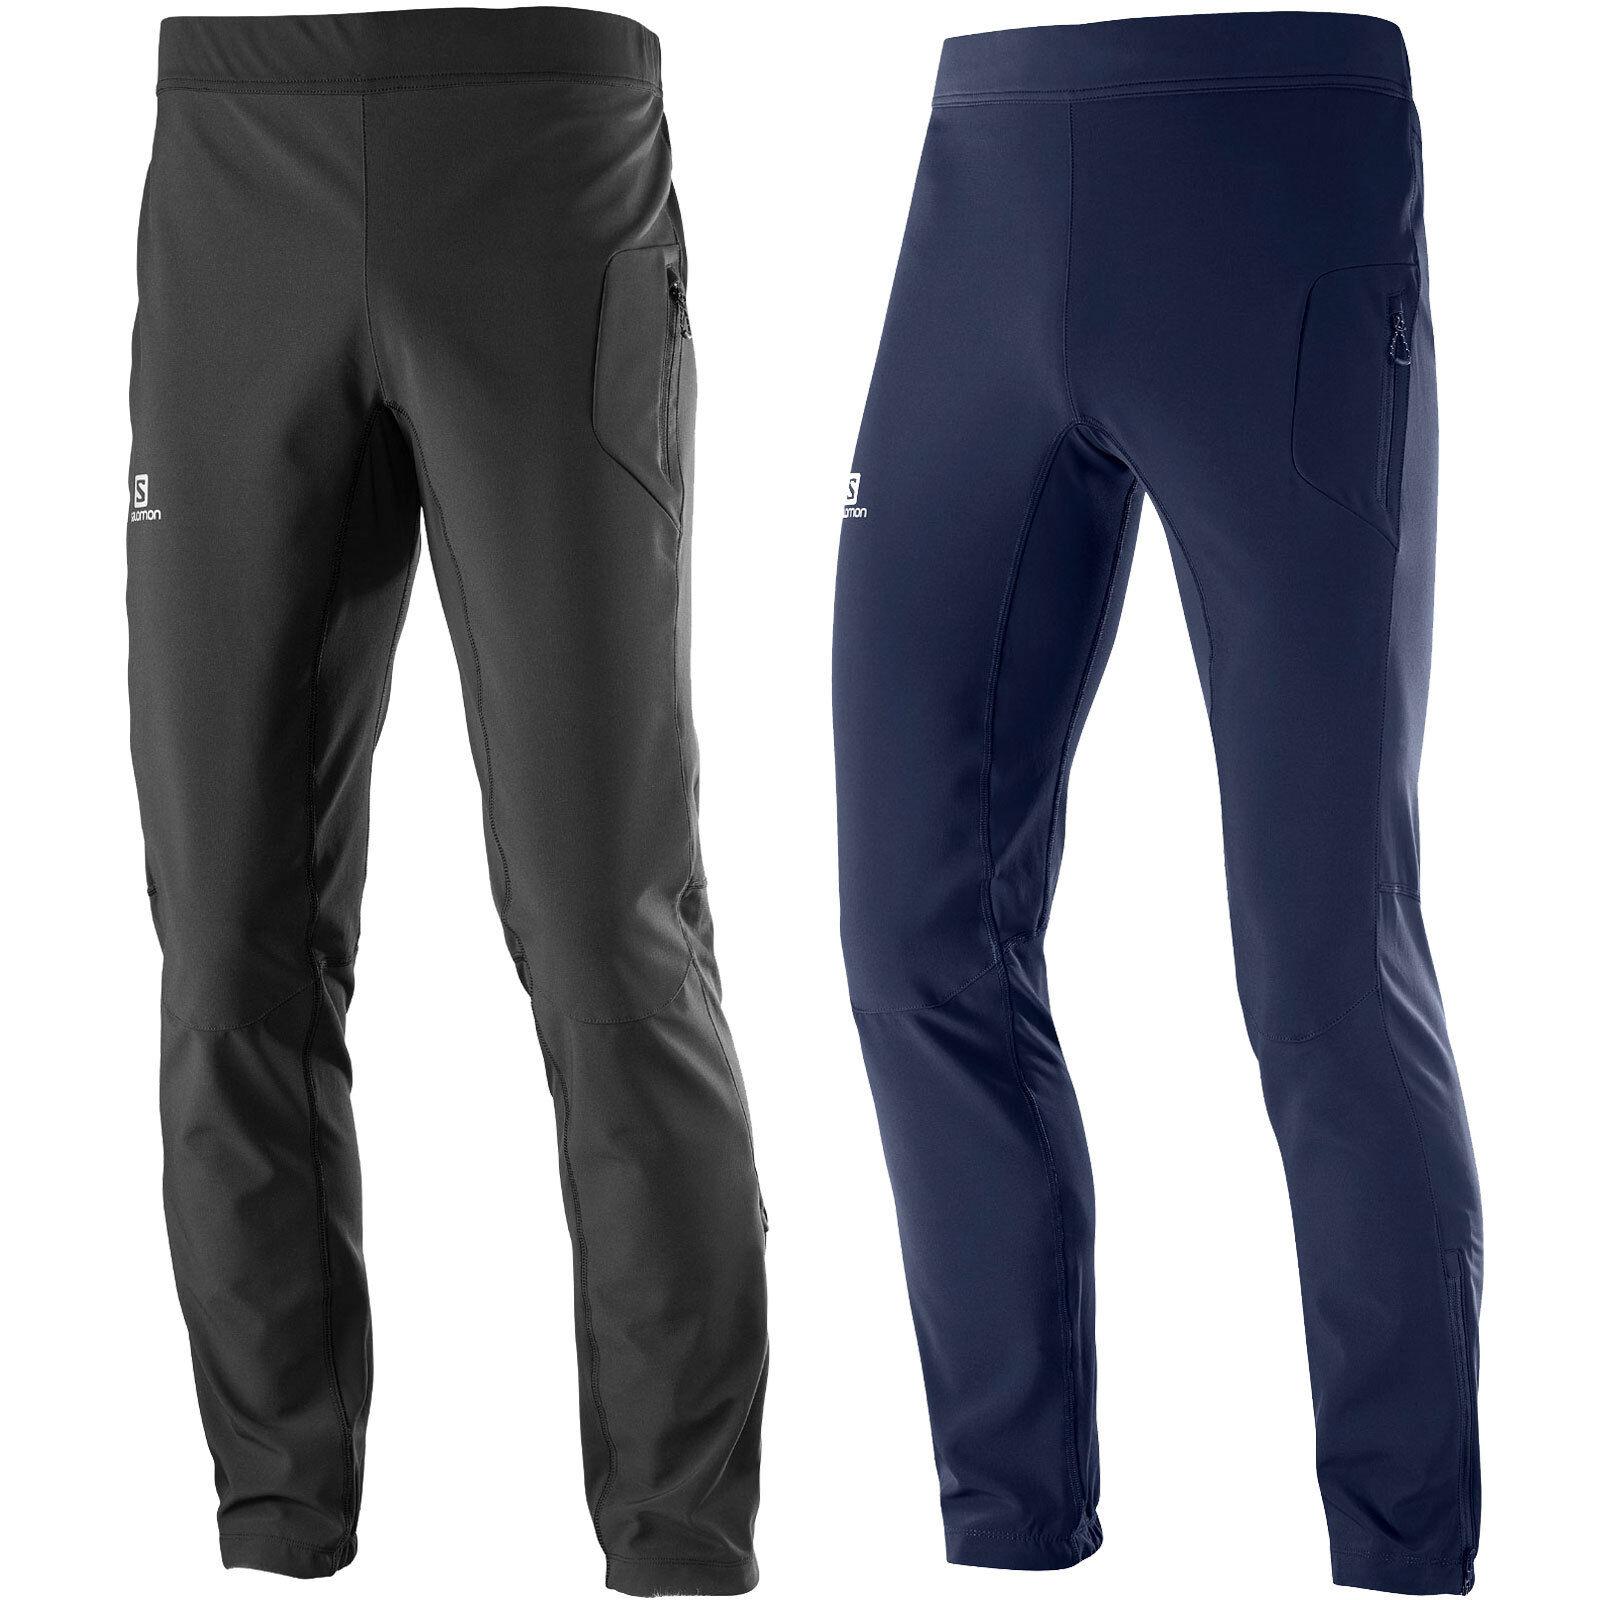 Salomon RS Warm Softshell Pant Herren-Trainingshose Herren-Trainingshose Herren-Trainingshose Laufhose Wintersport f40093